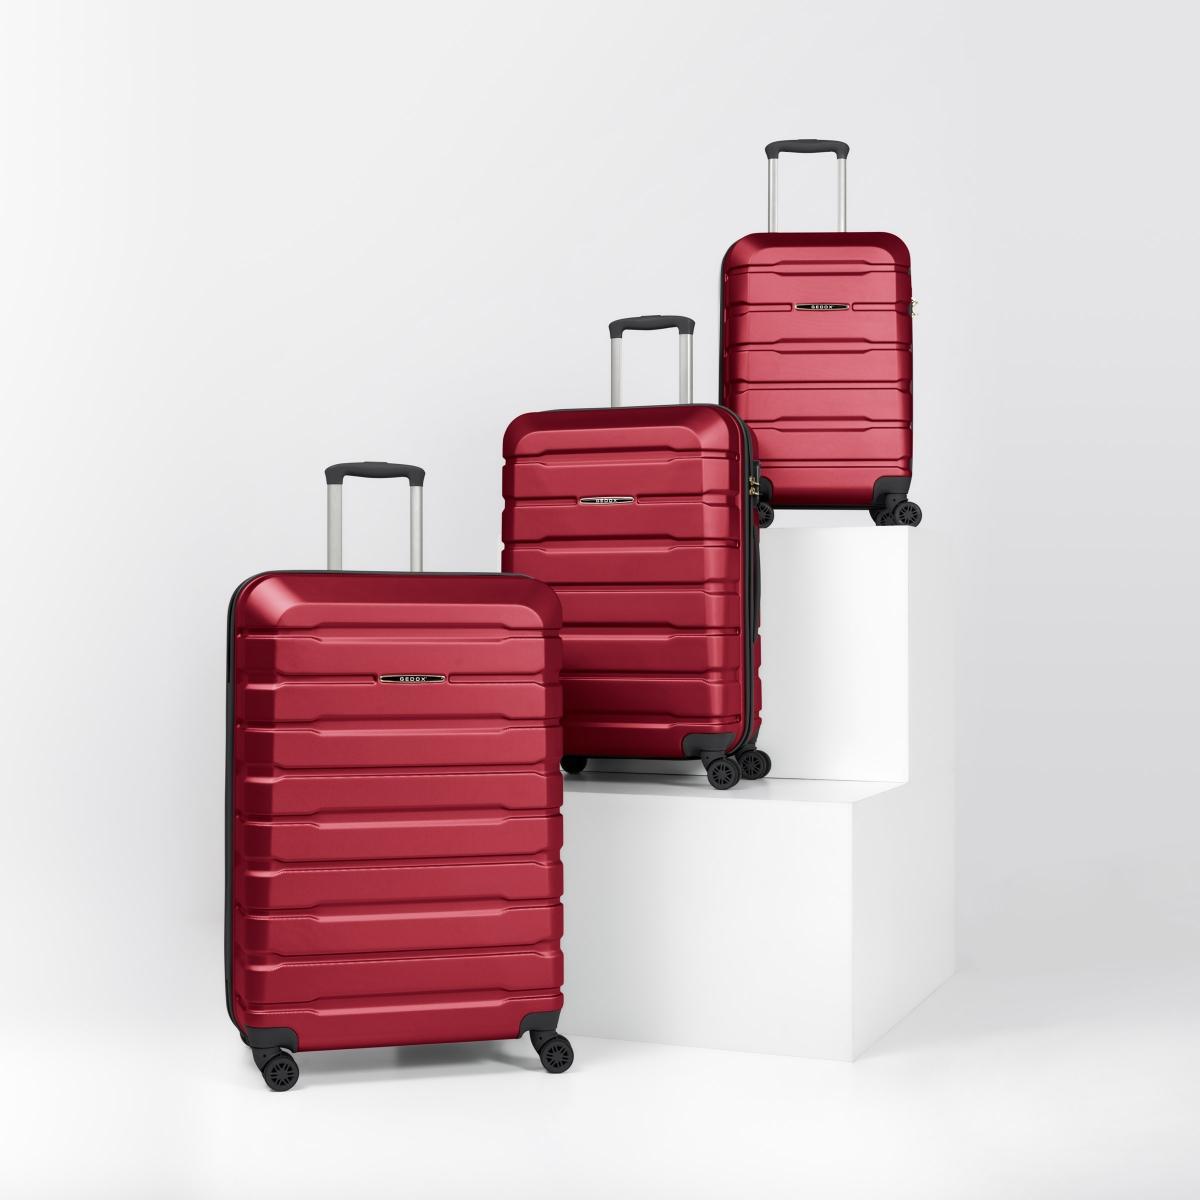 Gedox Abs Premium Tonaton 3'lü Valiz Seyahat Seti - Model:500.13 Bordo